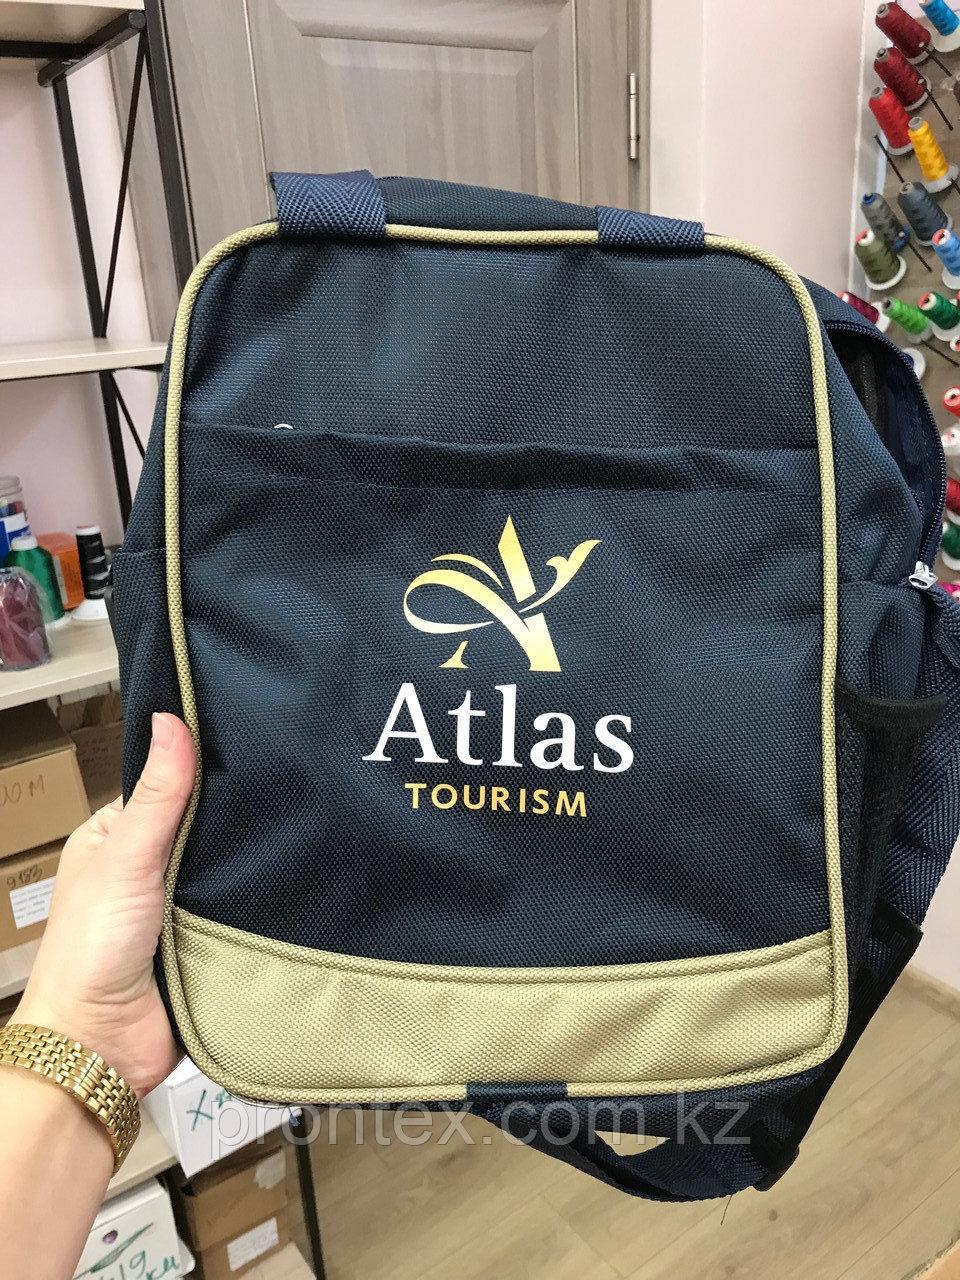 Нанесение логотипа на сумку.